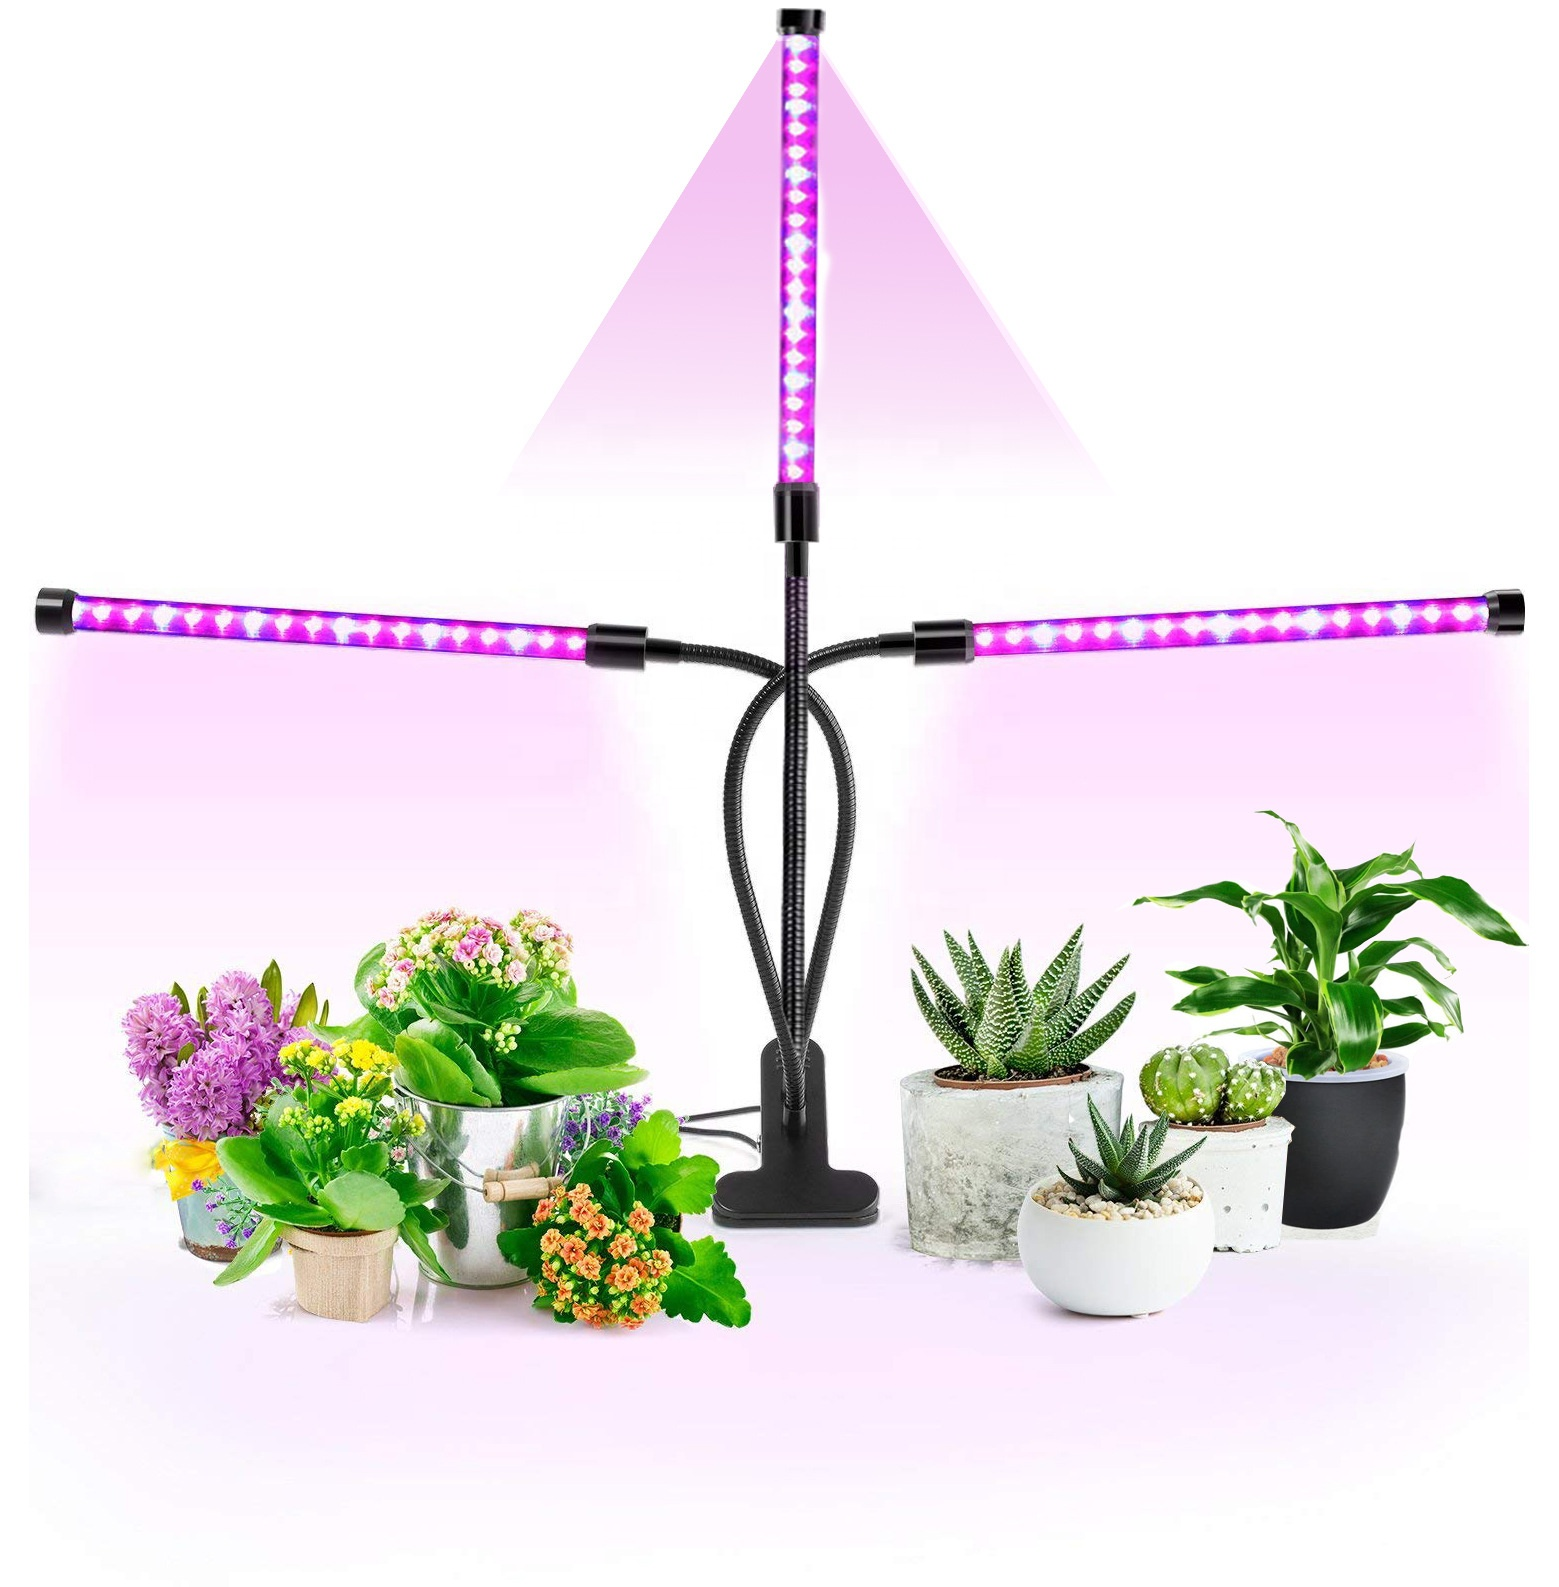 Lampu Taman Dalam Ruangan Lampu Pertanian 5v 18w 54led Spektrum Penuh Waktu Dapat Diredupkan Led Lampu Pertumbuhan Tanaman Untuk Taman Dalam Ruangan Buy Pertumbuhan Tanaman Lampu Led Pertumbuhan Tanaman Lampu Led Grow